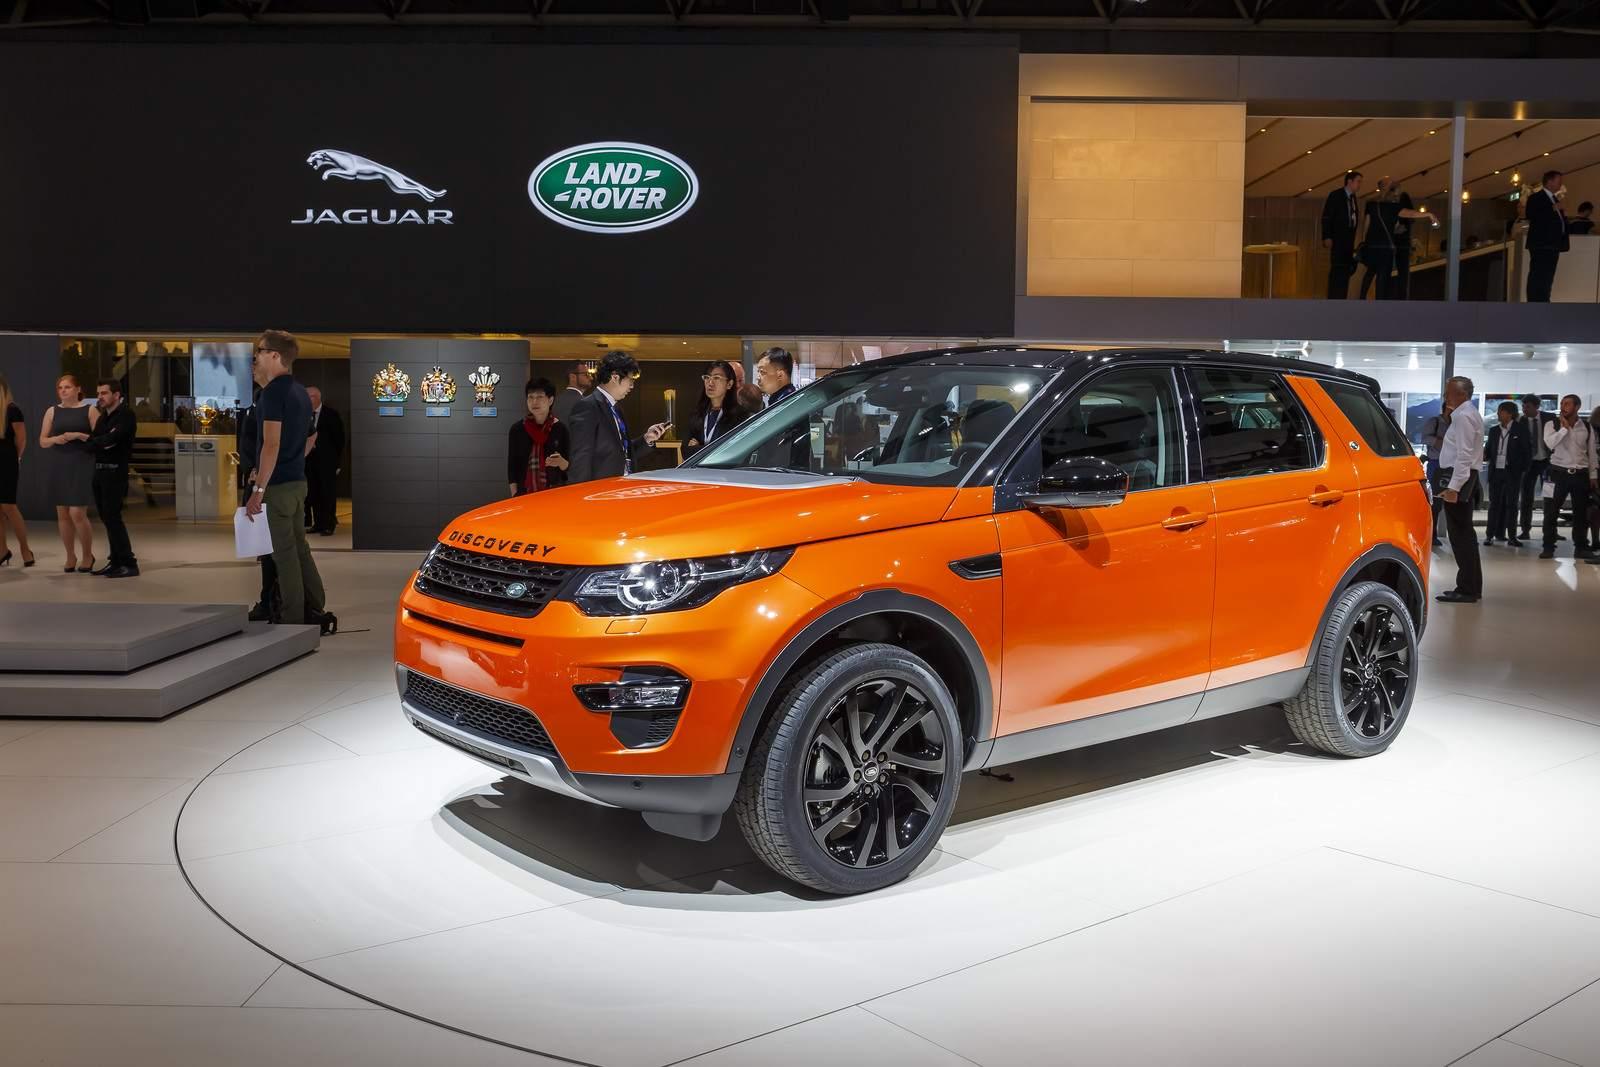 paris motor show Jaguar and Land Rover at Paris Auto Show 2014